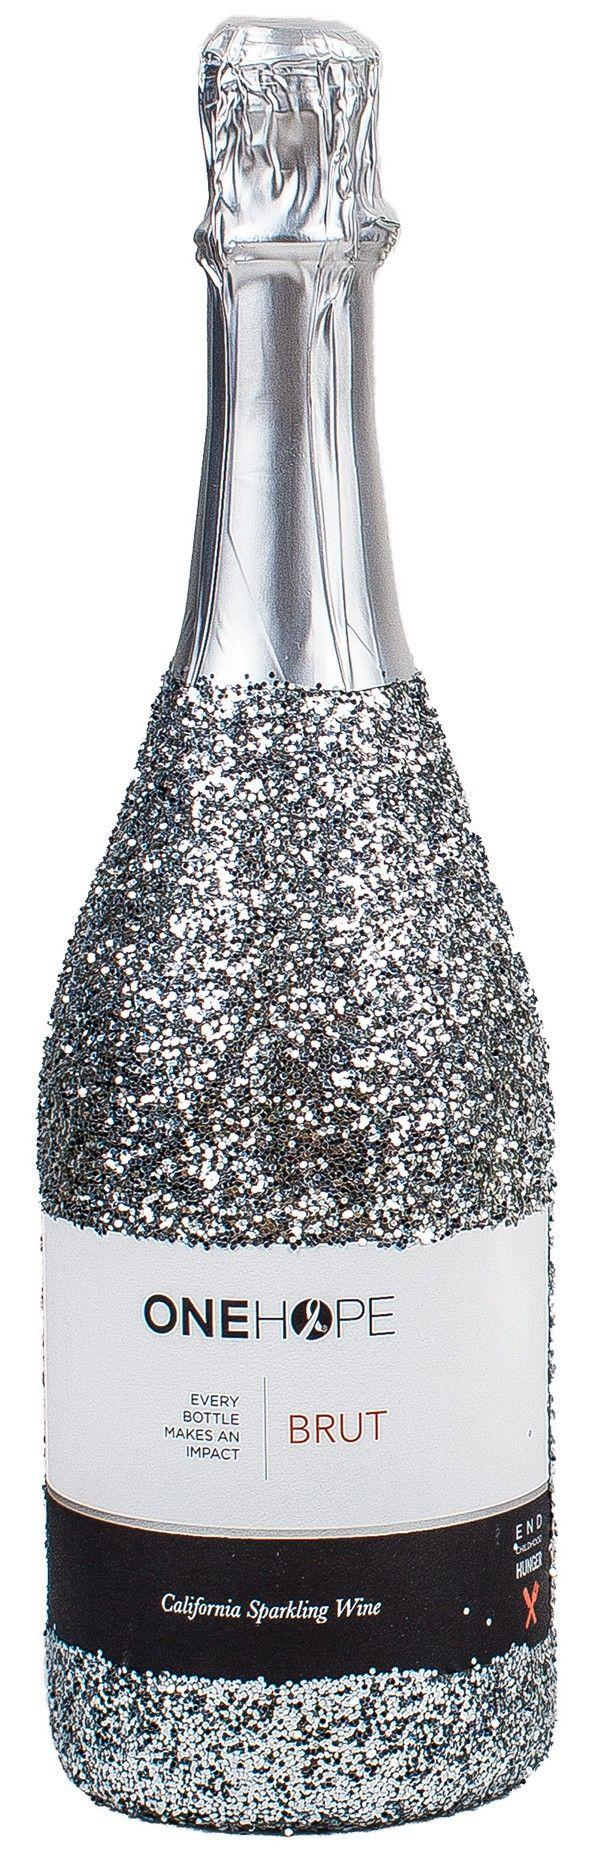 ONEHOPE Glitter Edition Brut Sparkling Wine - Sparkling Wine - Our Wines | ONEHOPE Wine